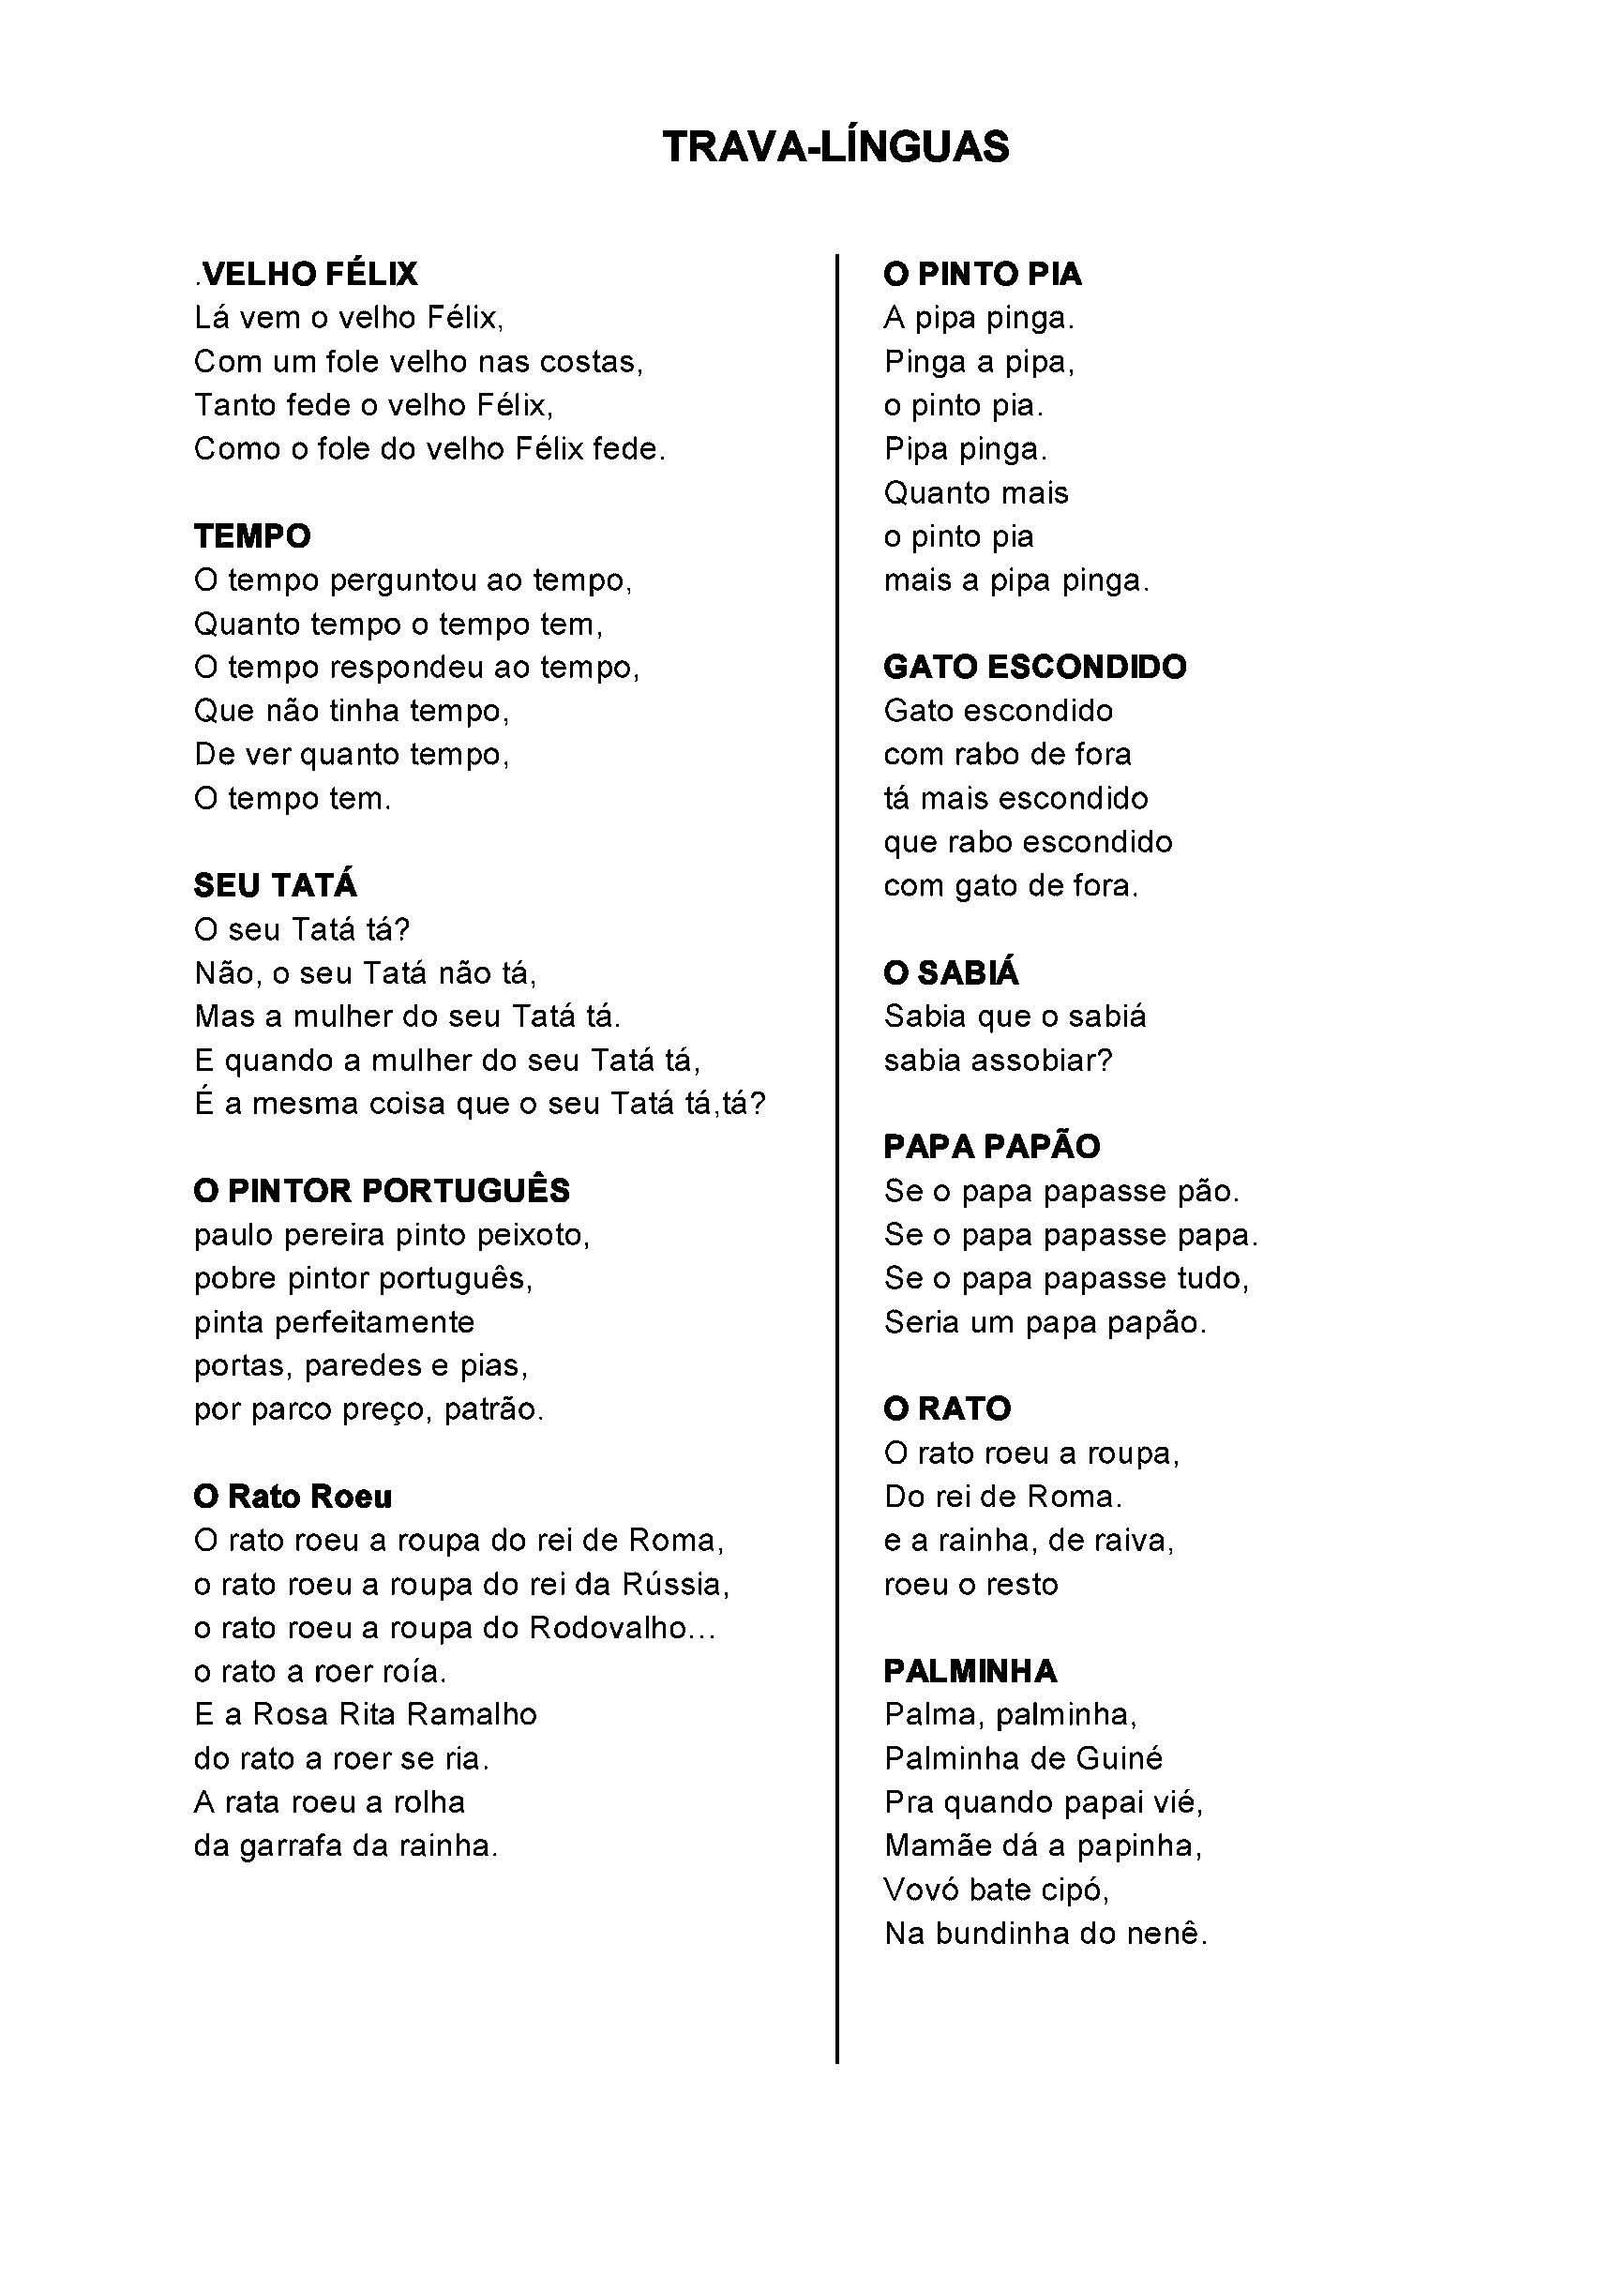 0254-folclore-trava-linguas-longas-p2